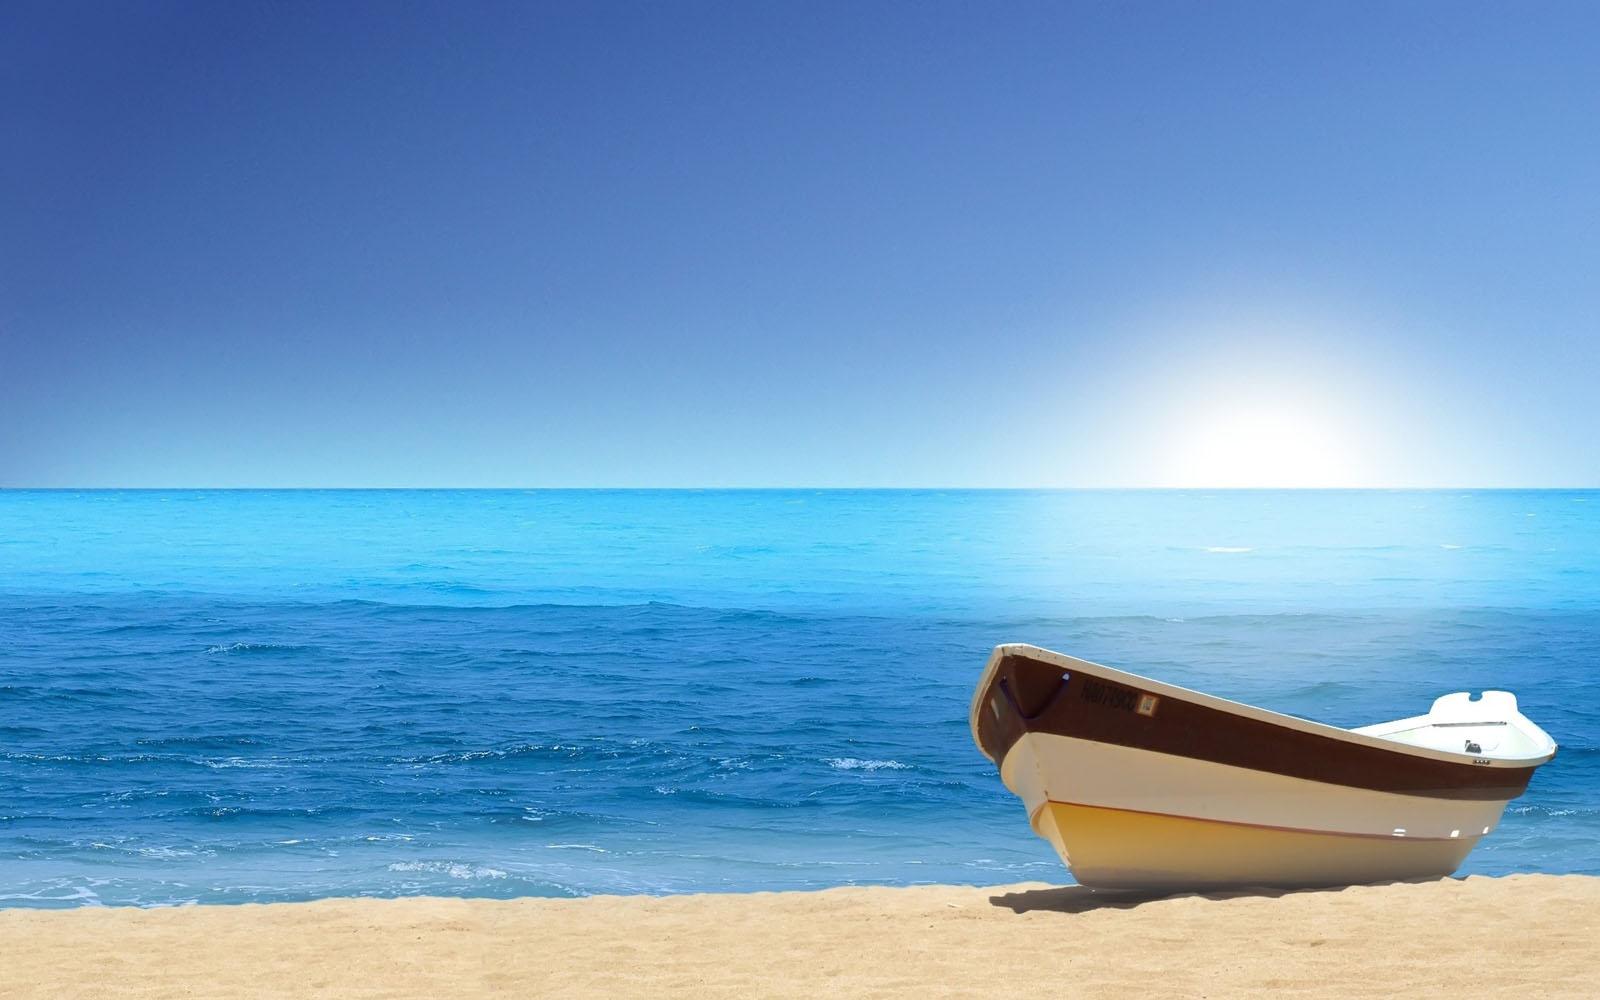 Cool Boats On Beach Wallpaper Images 34 Wallpaper High 1600x1000